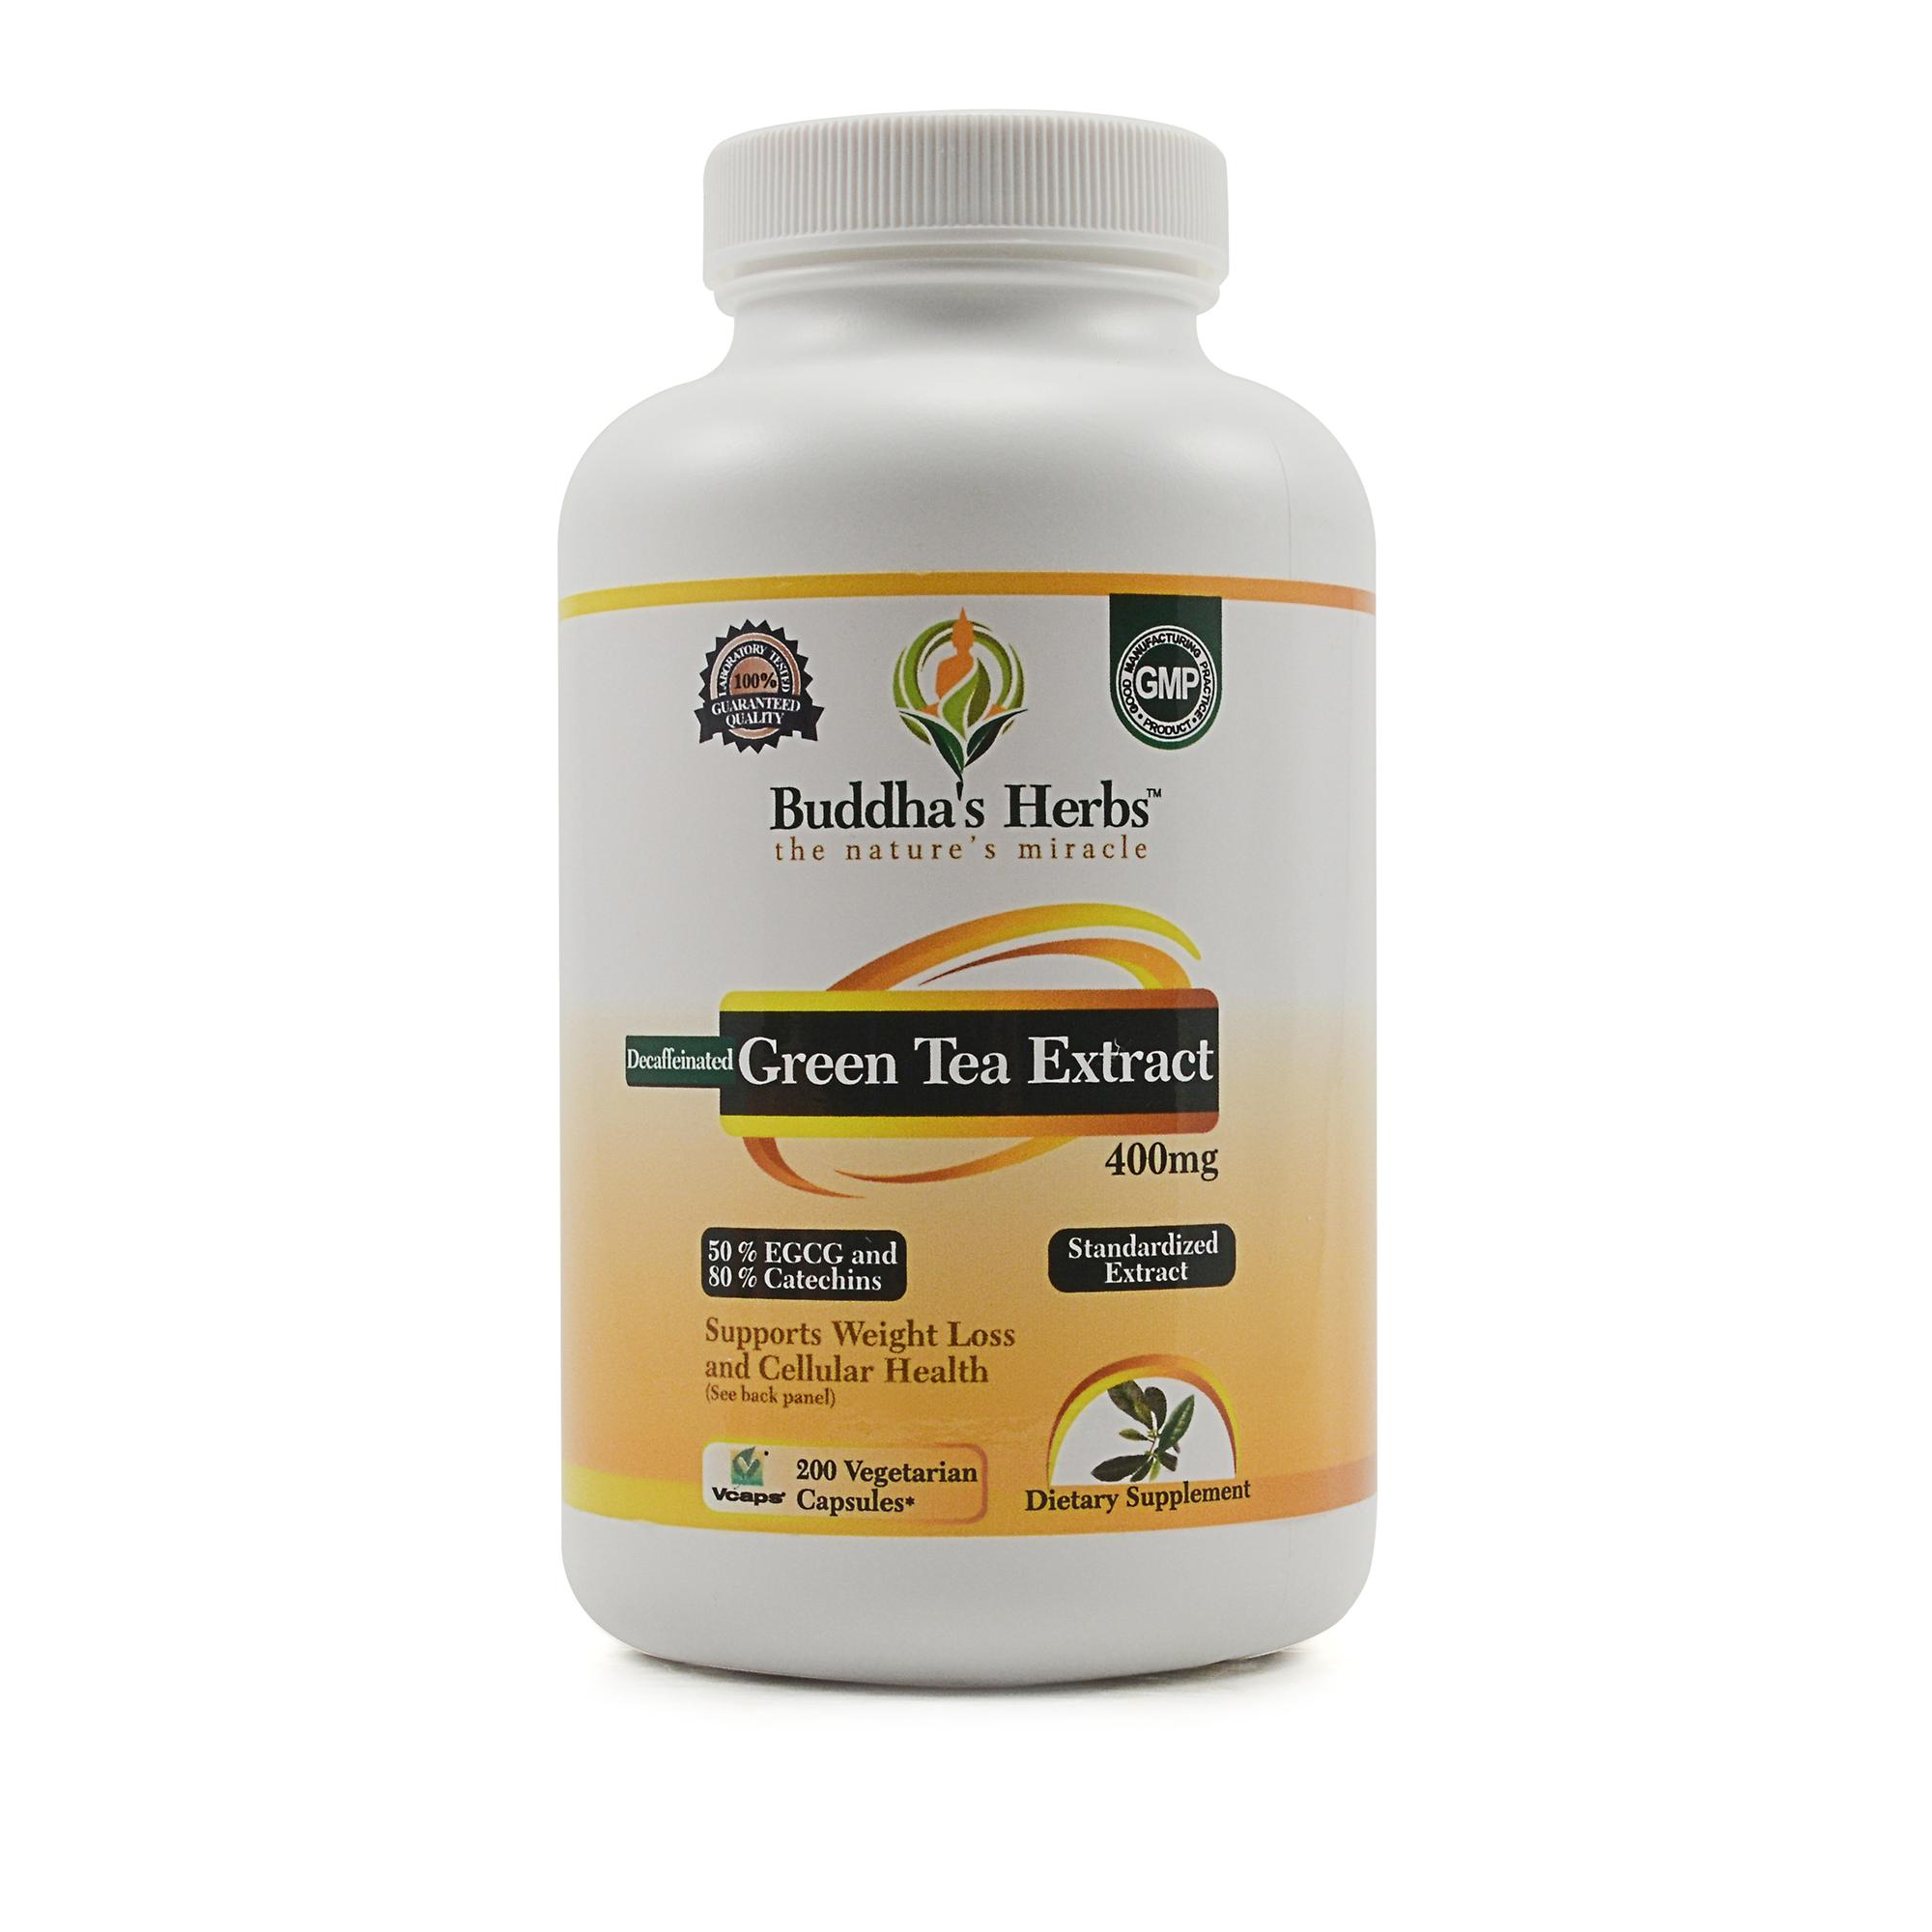 Decaffeinated green tea extract